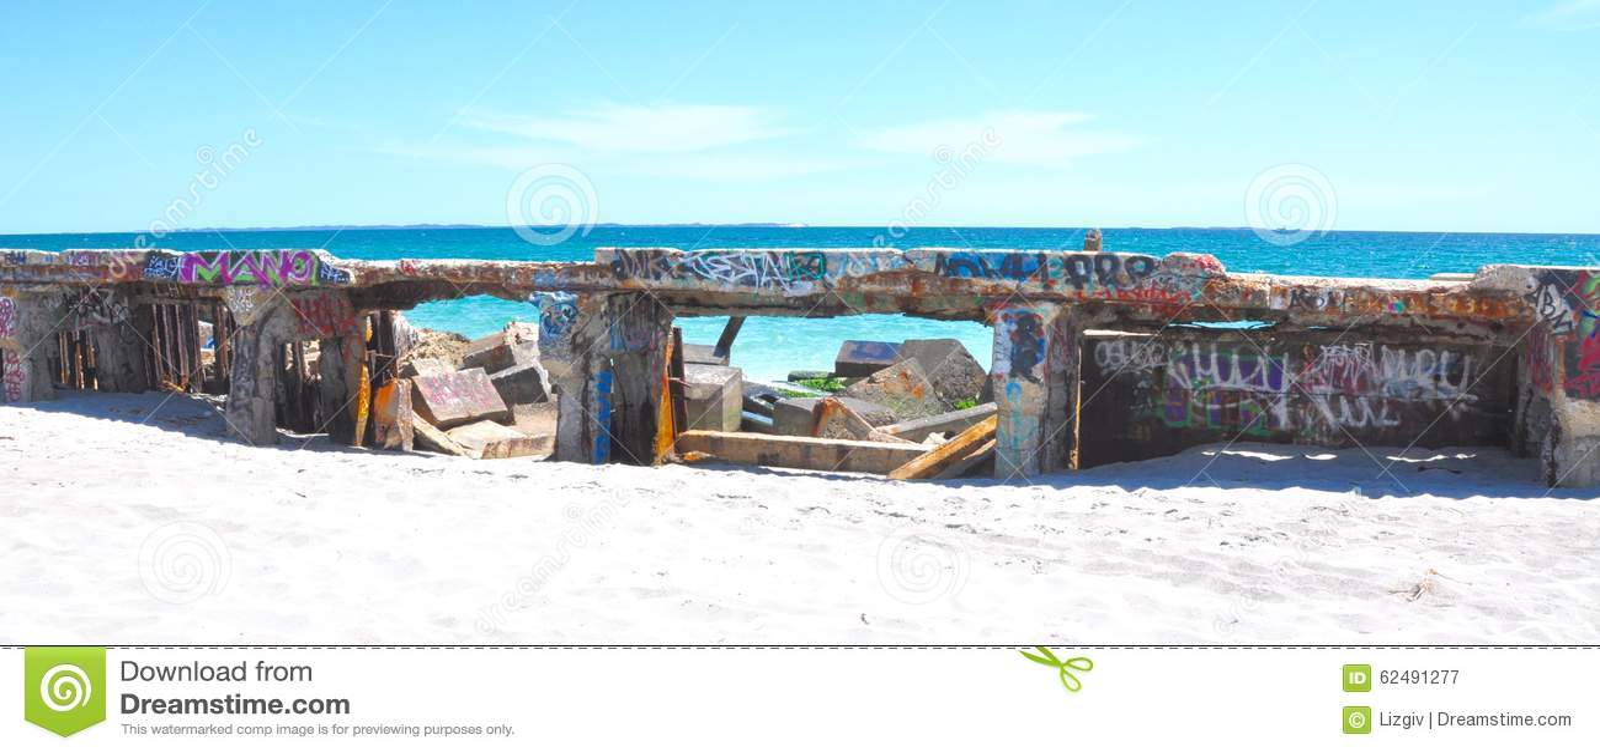 Concrete Breakwater with Tagging: Fremantle, Western Australia